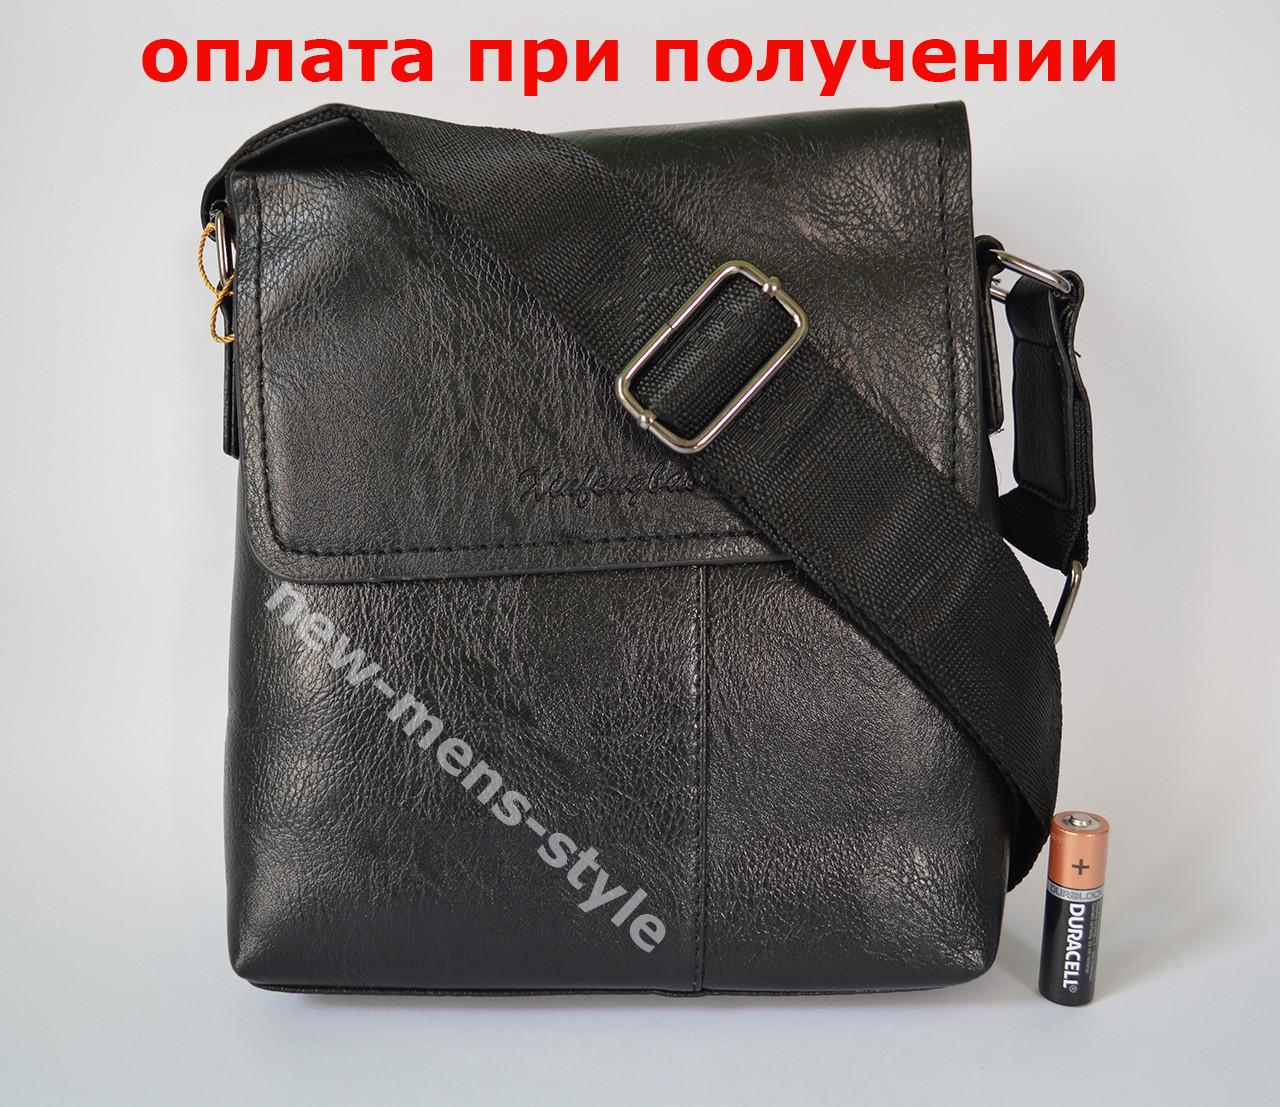 2202b9e56d13 Мужская кожаная сумка, барсетка под бренд Polo Jeep Xinfengbao купить -